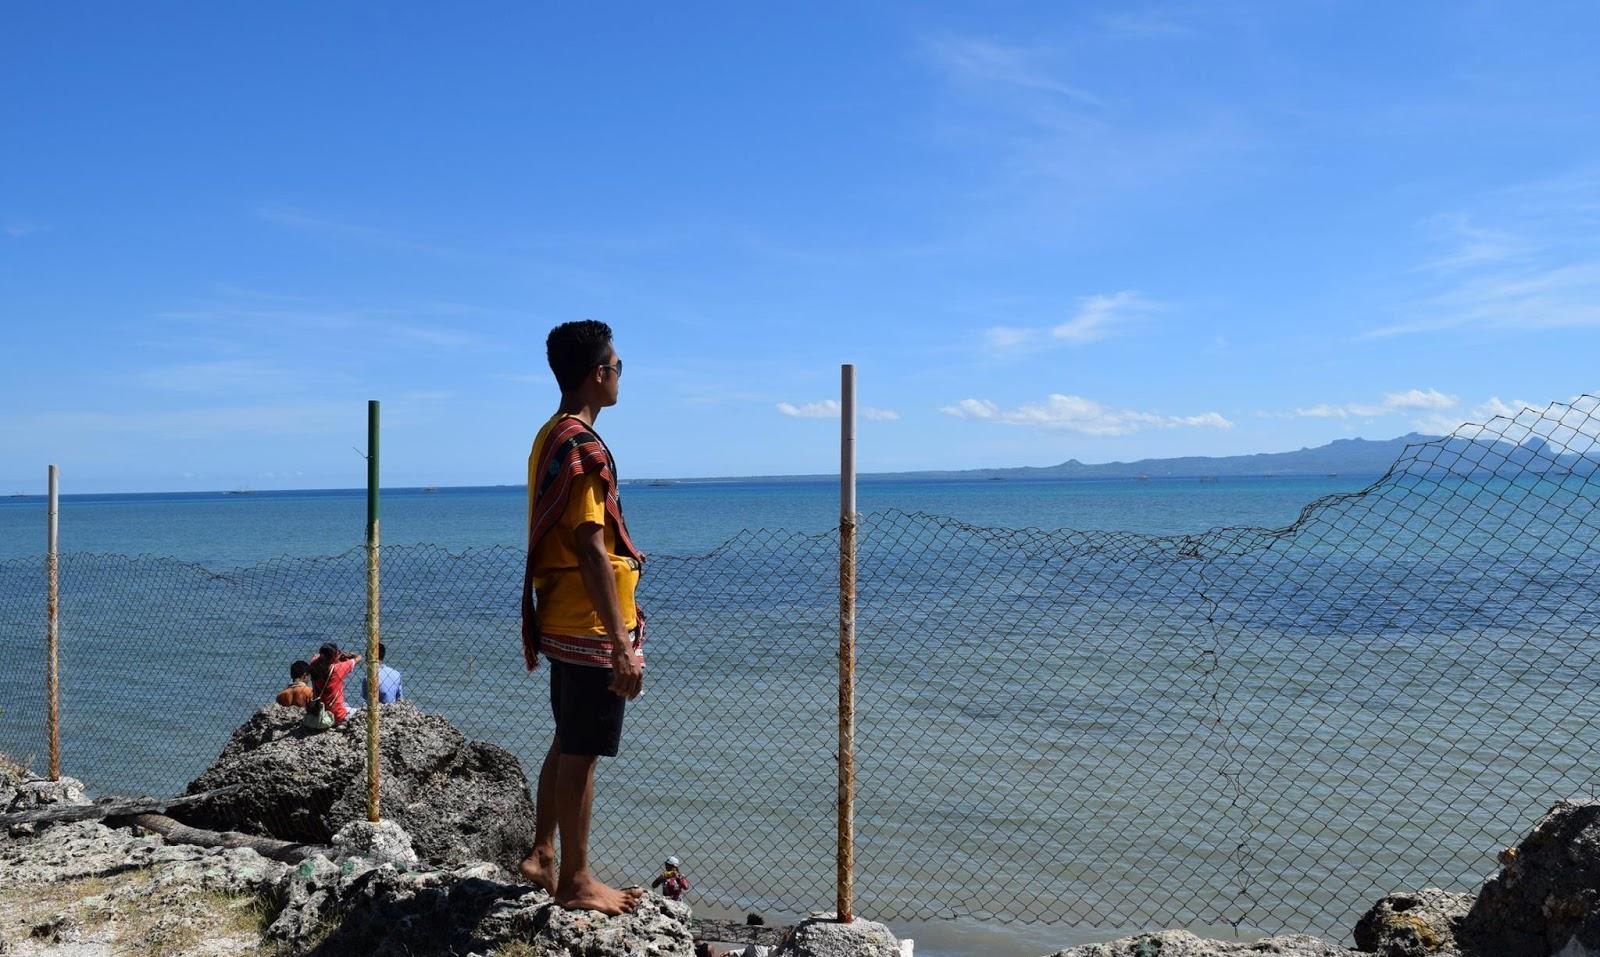 Arianto Ntt Pantai Batu Nona Kota Kupang Oesapa Tarus Turun